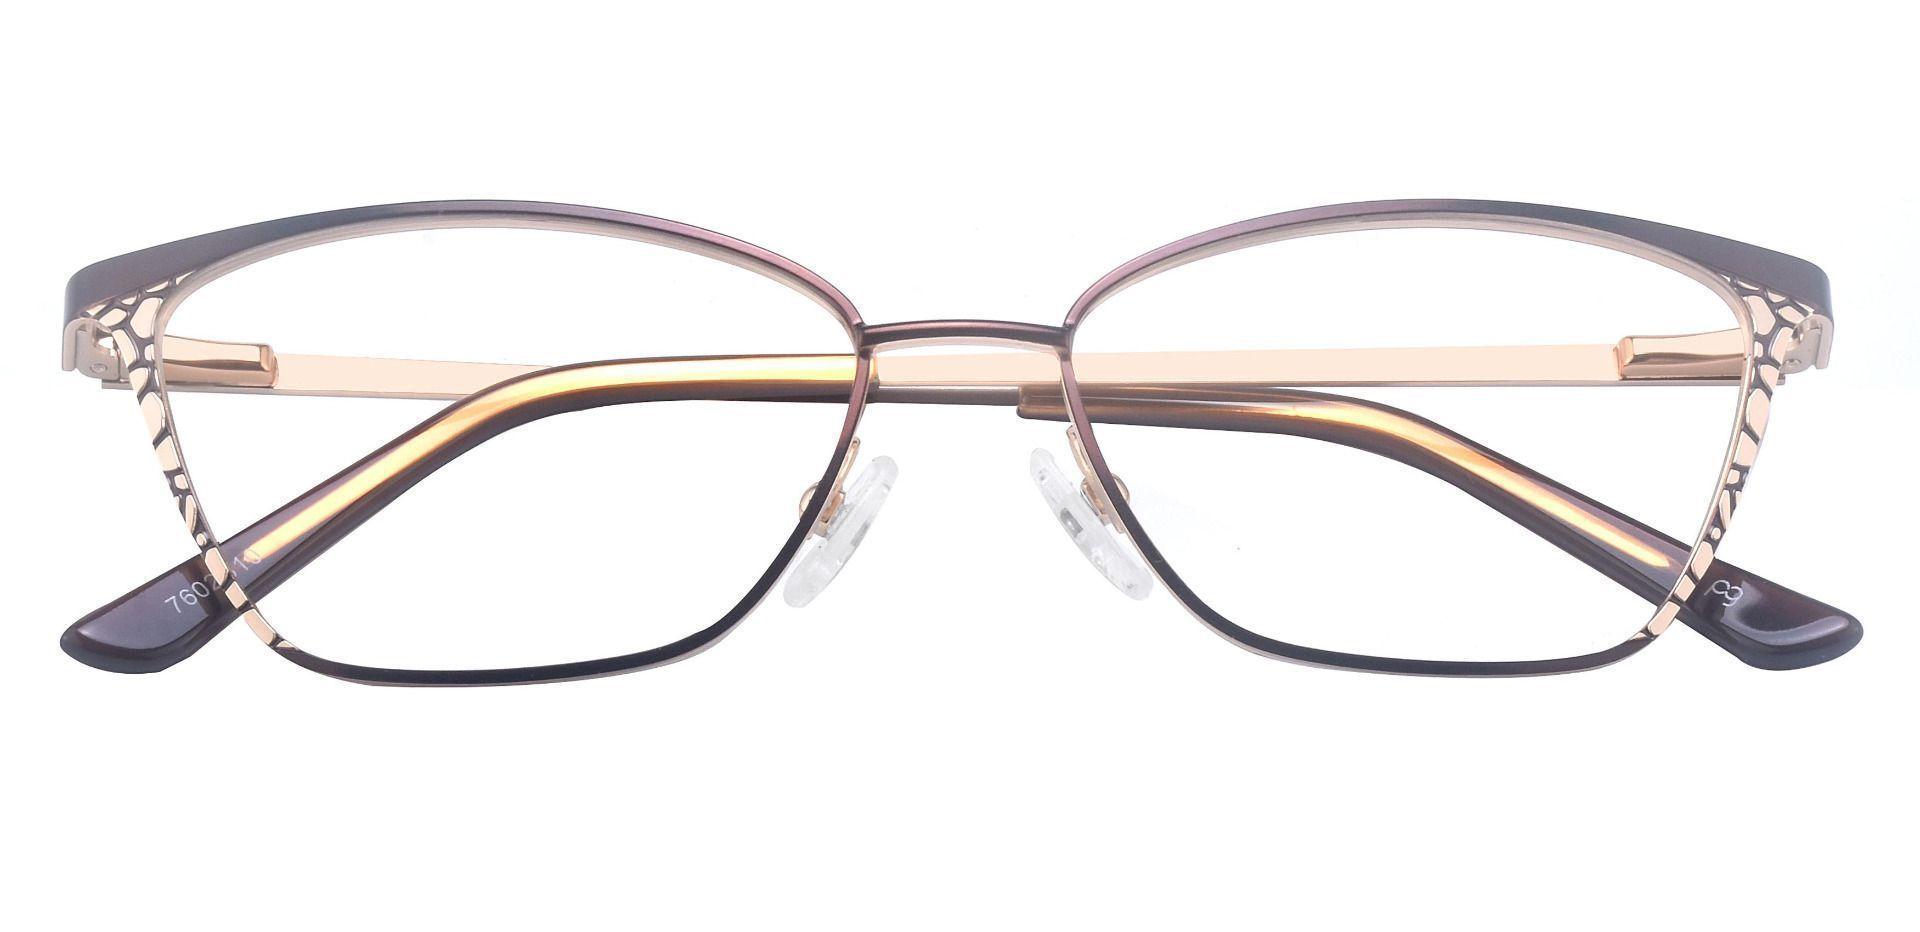 Solange Cat Eye Prescription Glasses - Brown